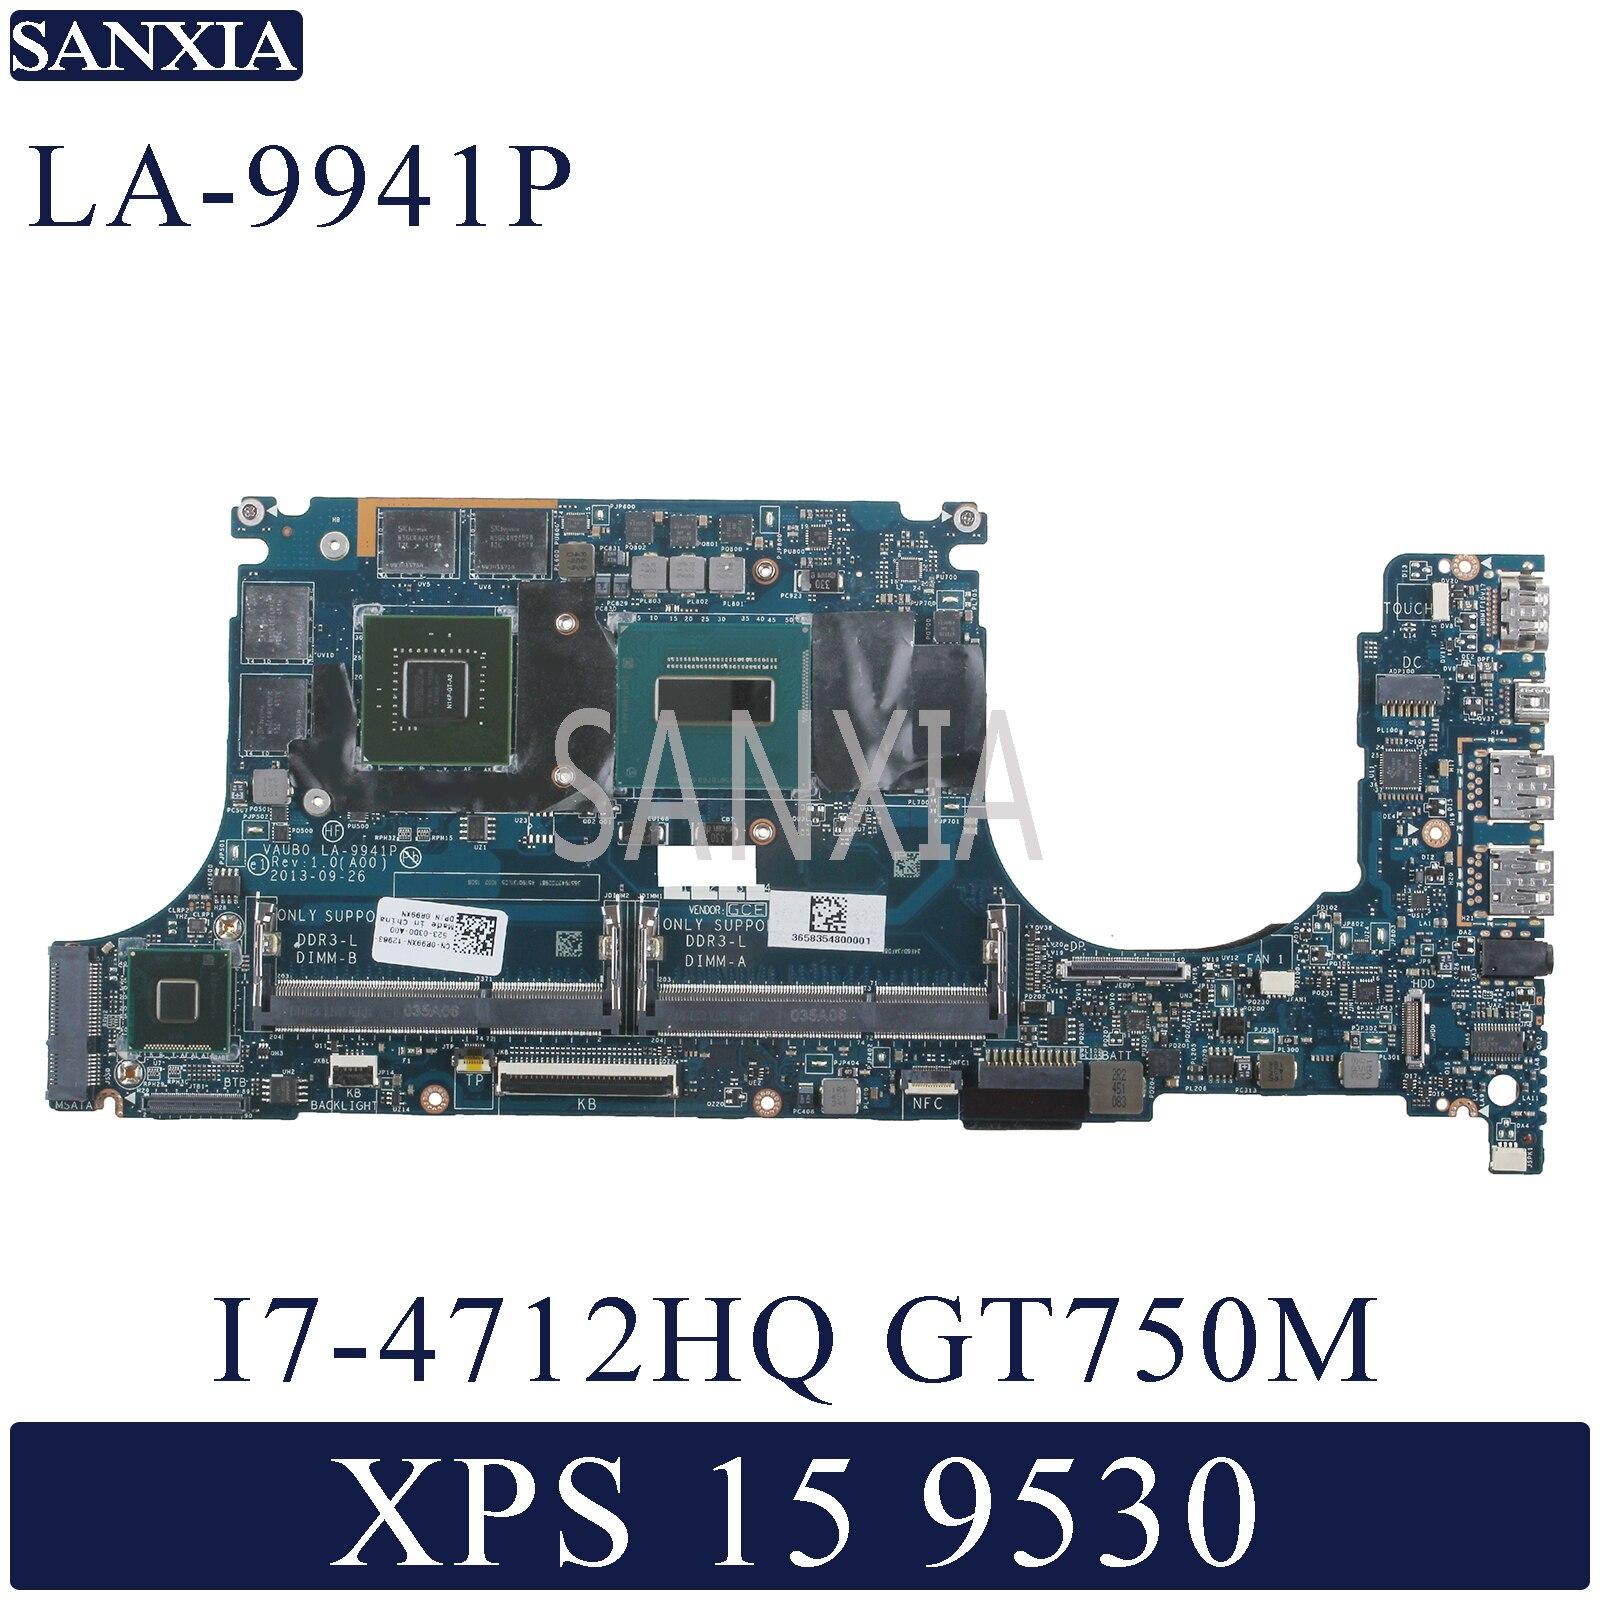 KEFU LA-9941P Laptop Motherboard For Dell XPS-15 9530 Original Mainboard I7-4712HQ/4702HQ GT750M